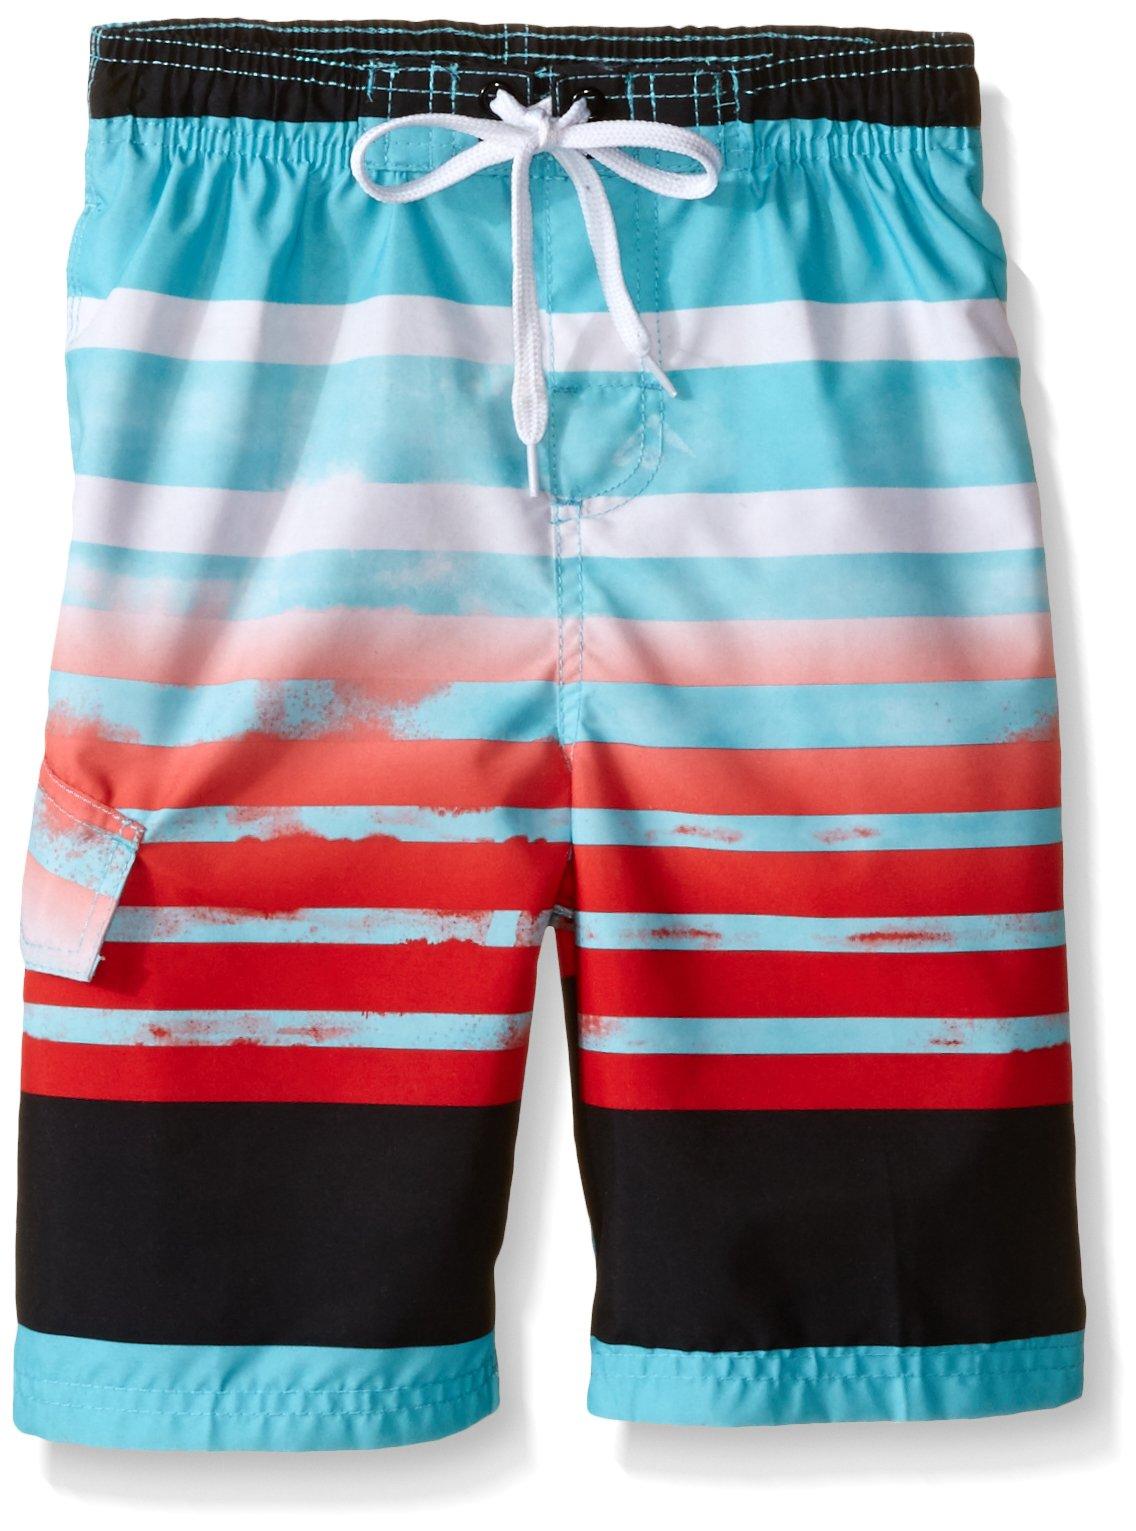 Kanu Surf Little Boys' Reflection Stripe Swim Trunk, Aqua, Medium (5/6)